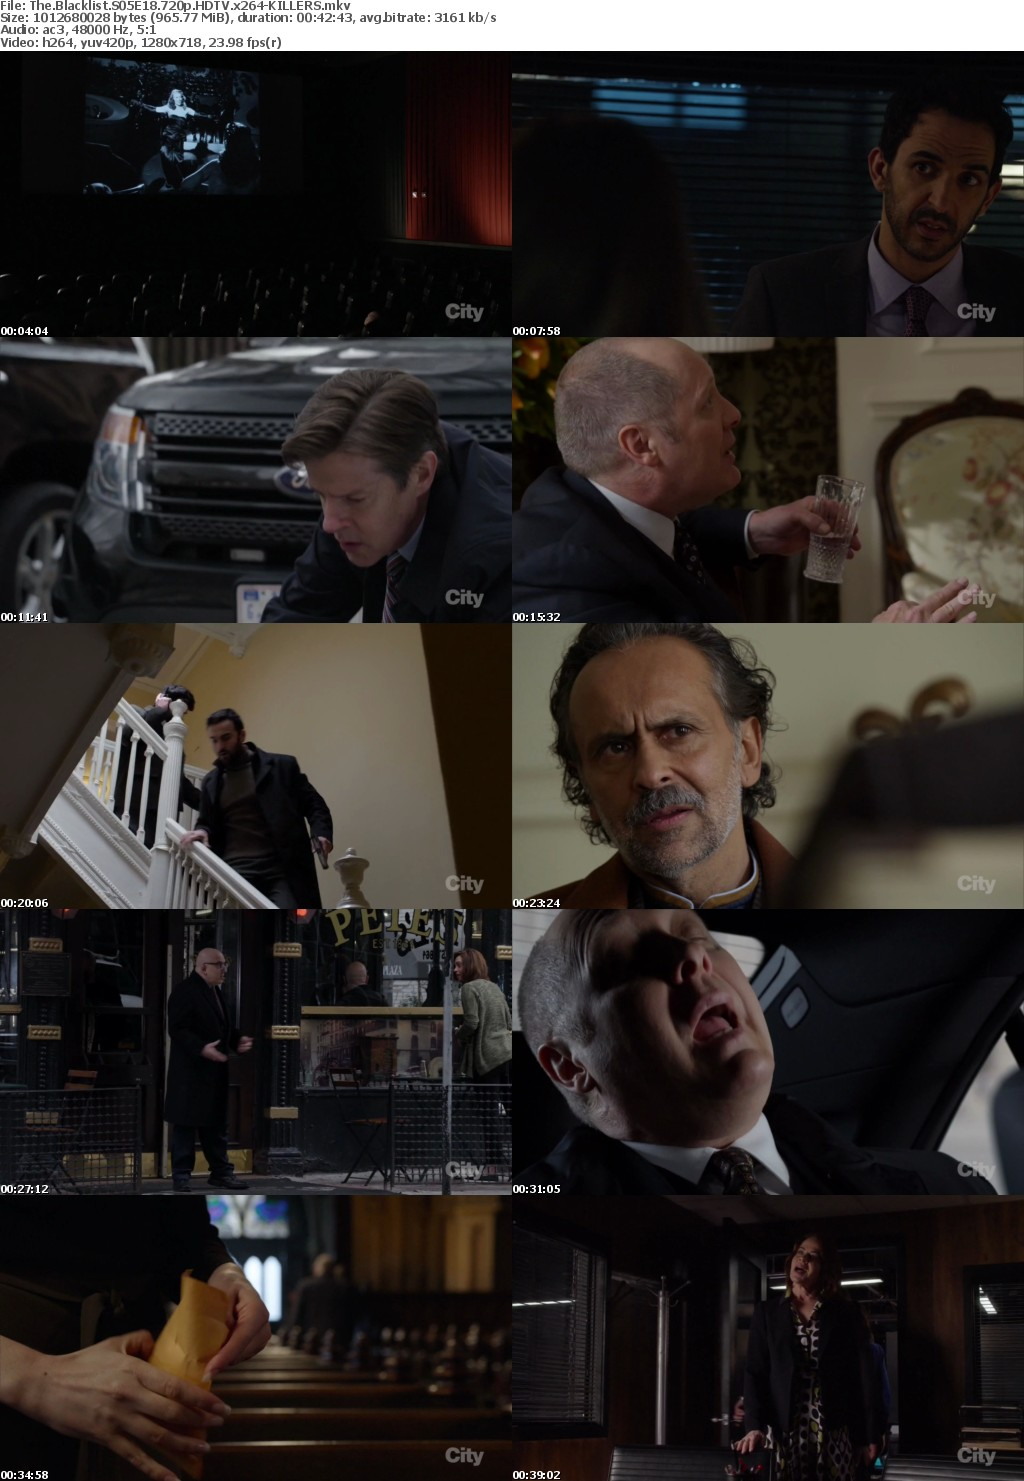 The Blacklist S05E18 720p HDTV x264-KILLERS